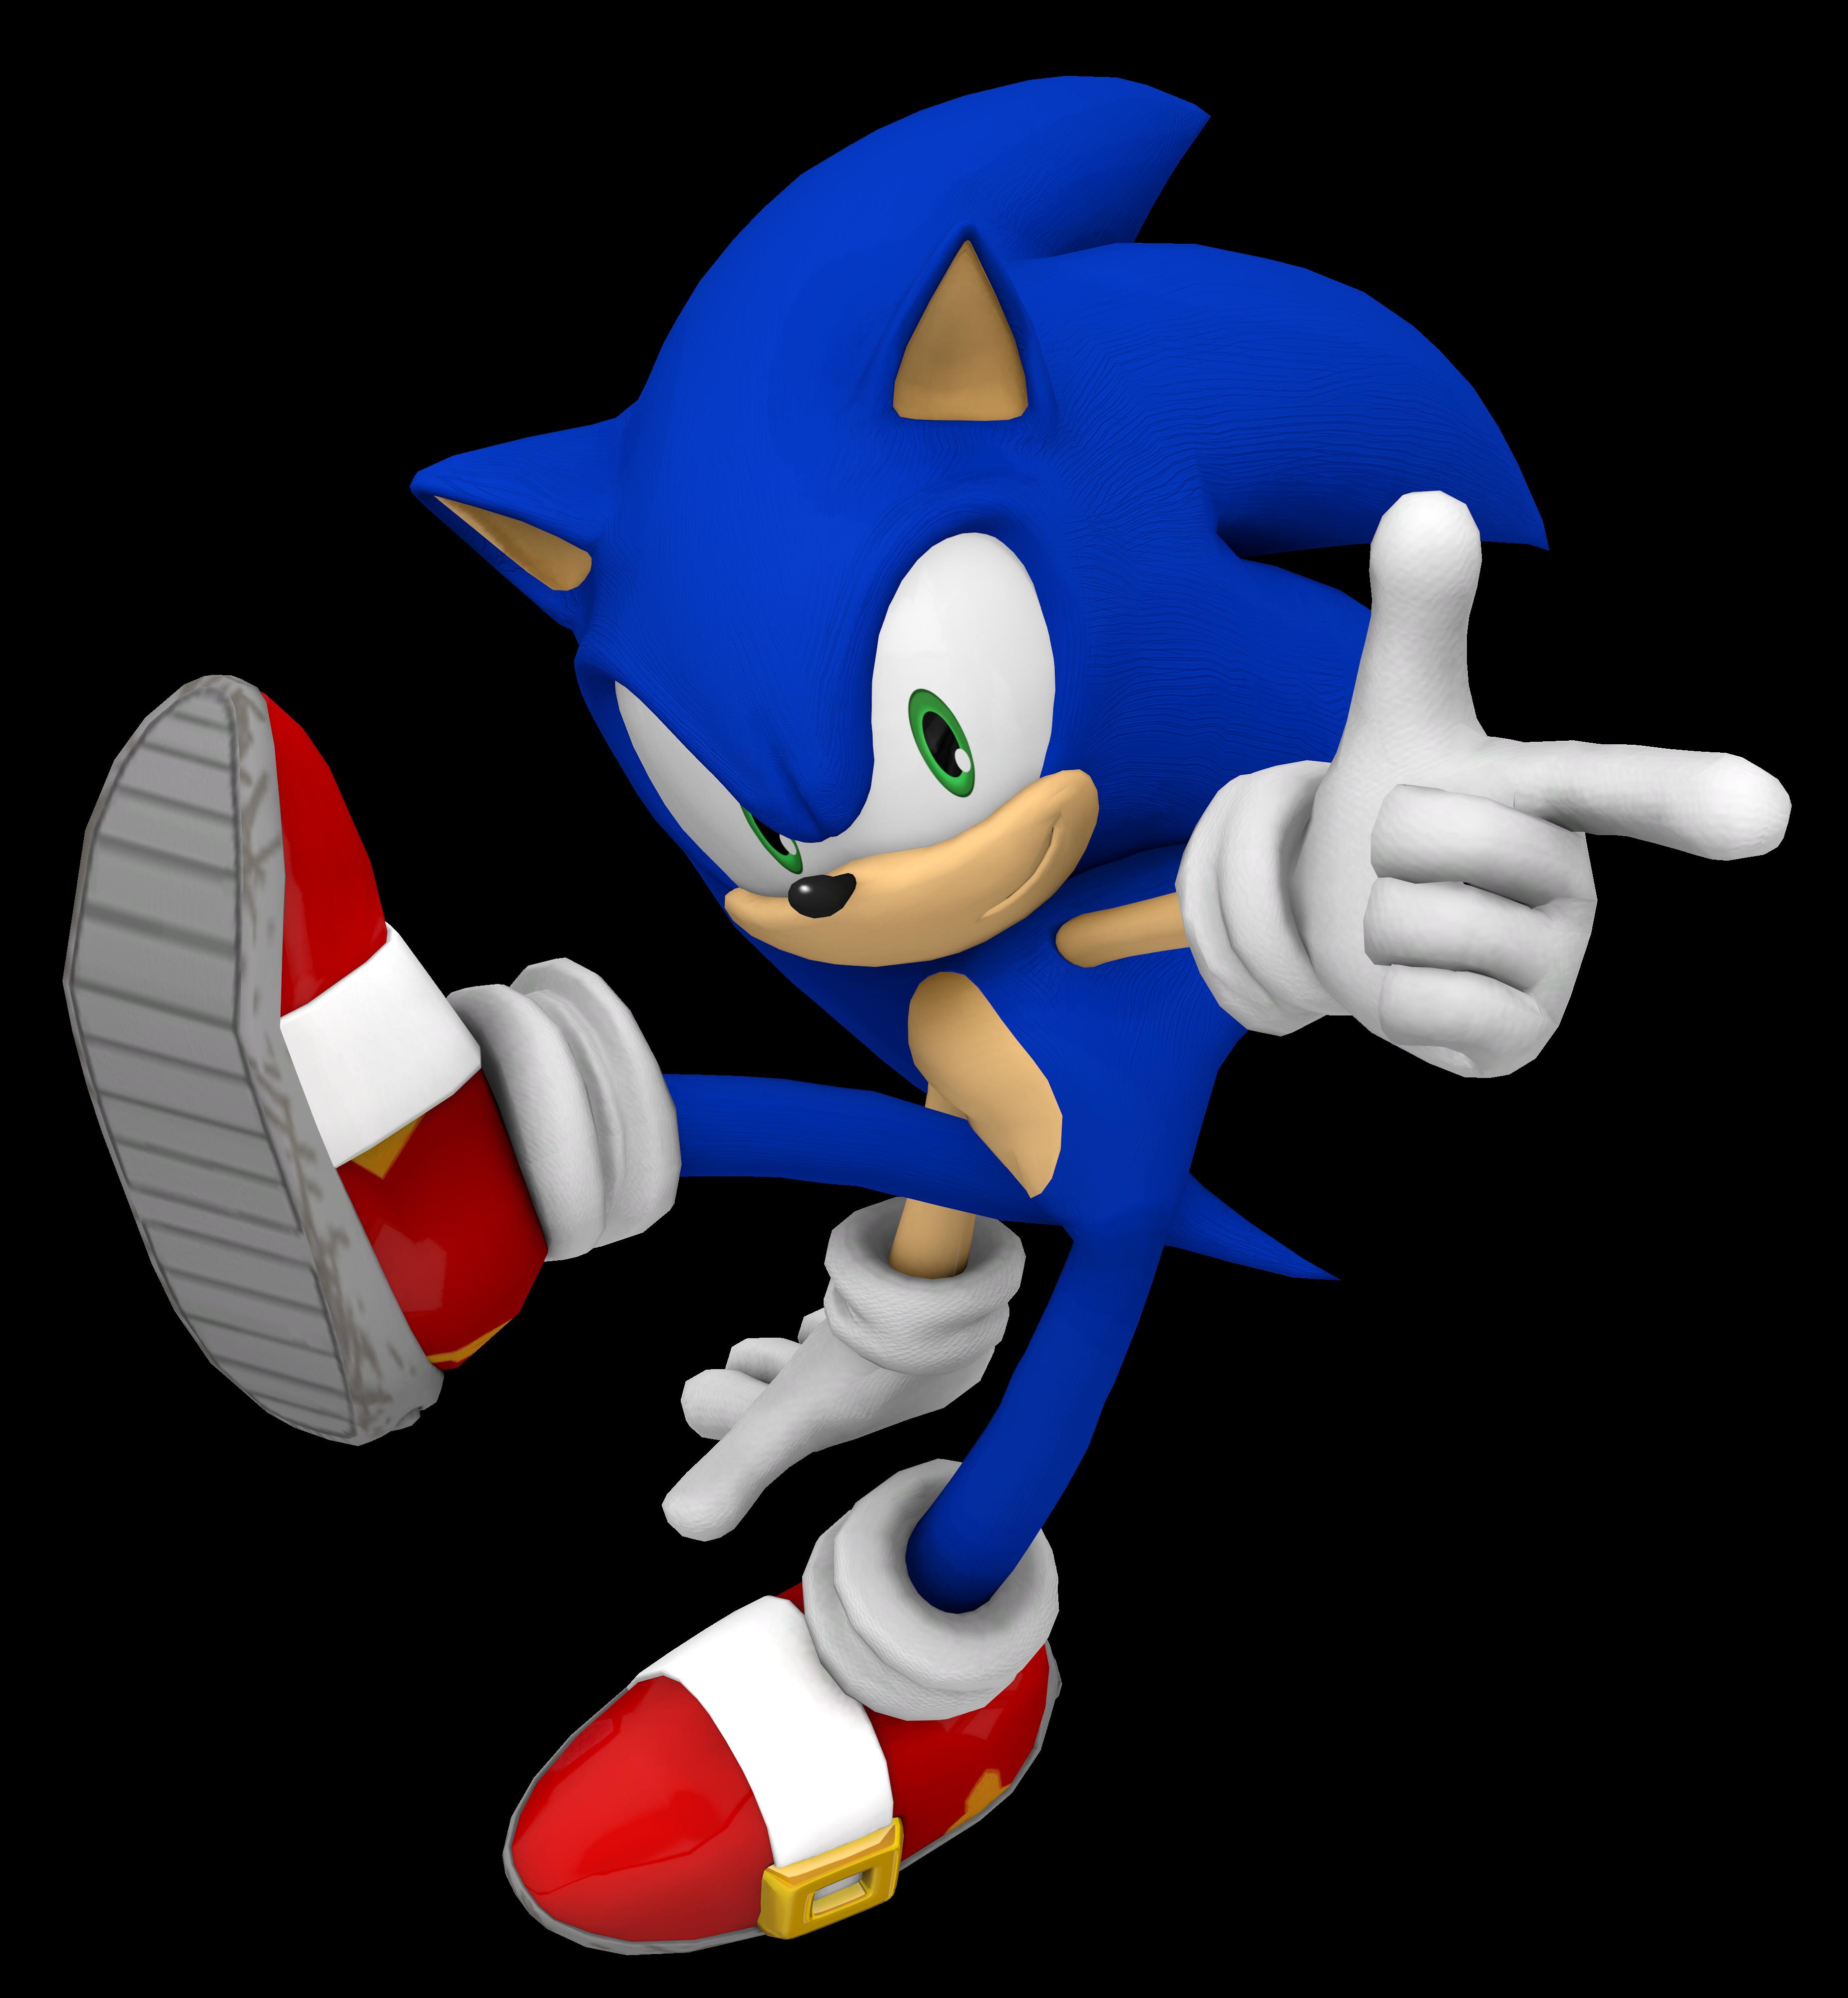 Sonic The Hedgehog 2d Artwork Recreation By Bandicootbrawl96 On